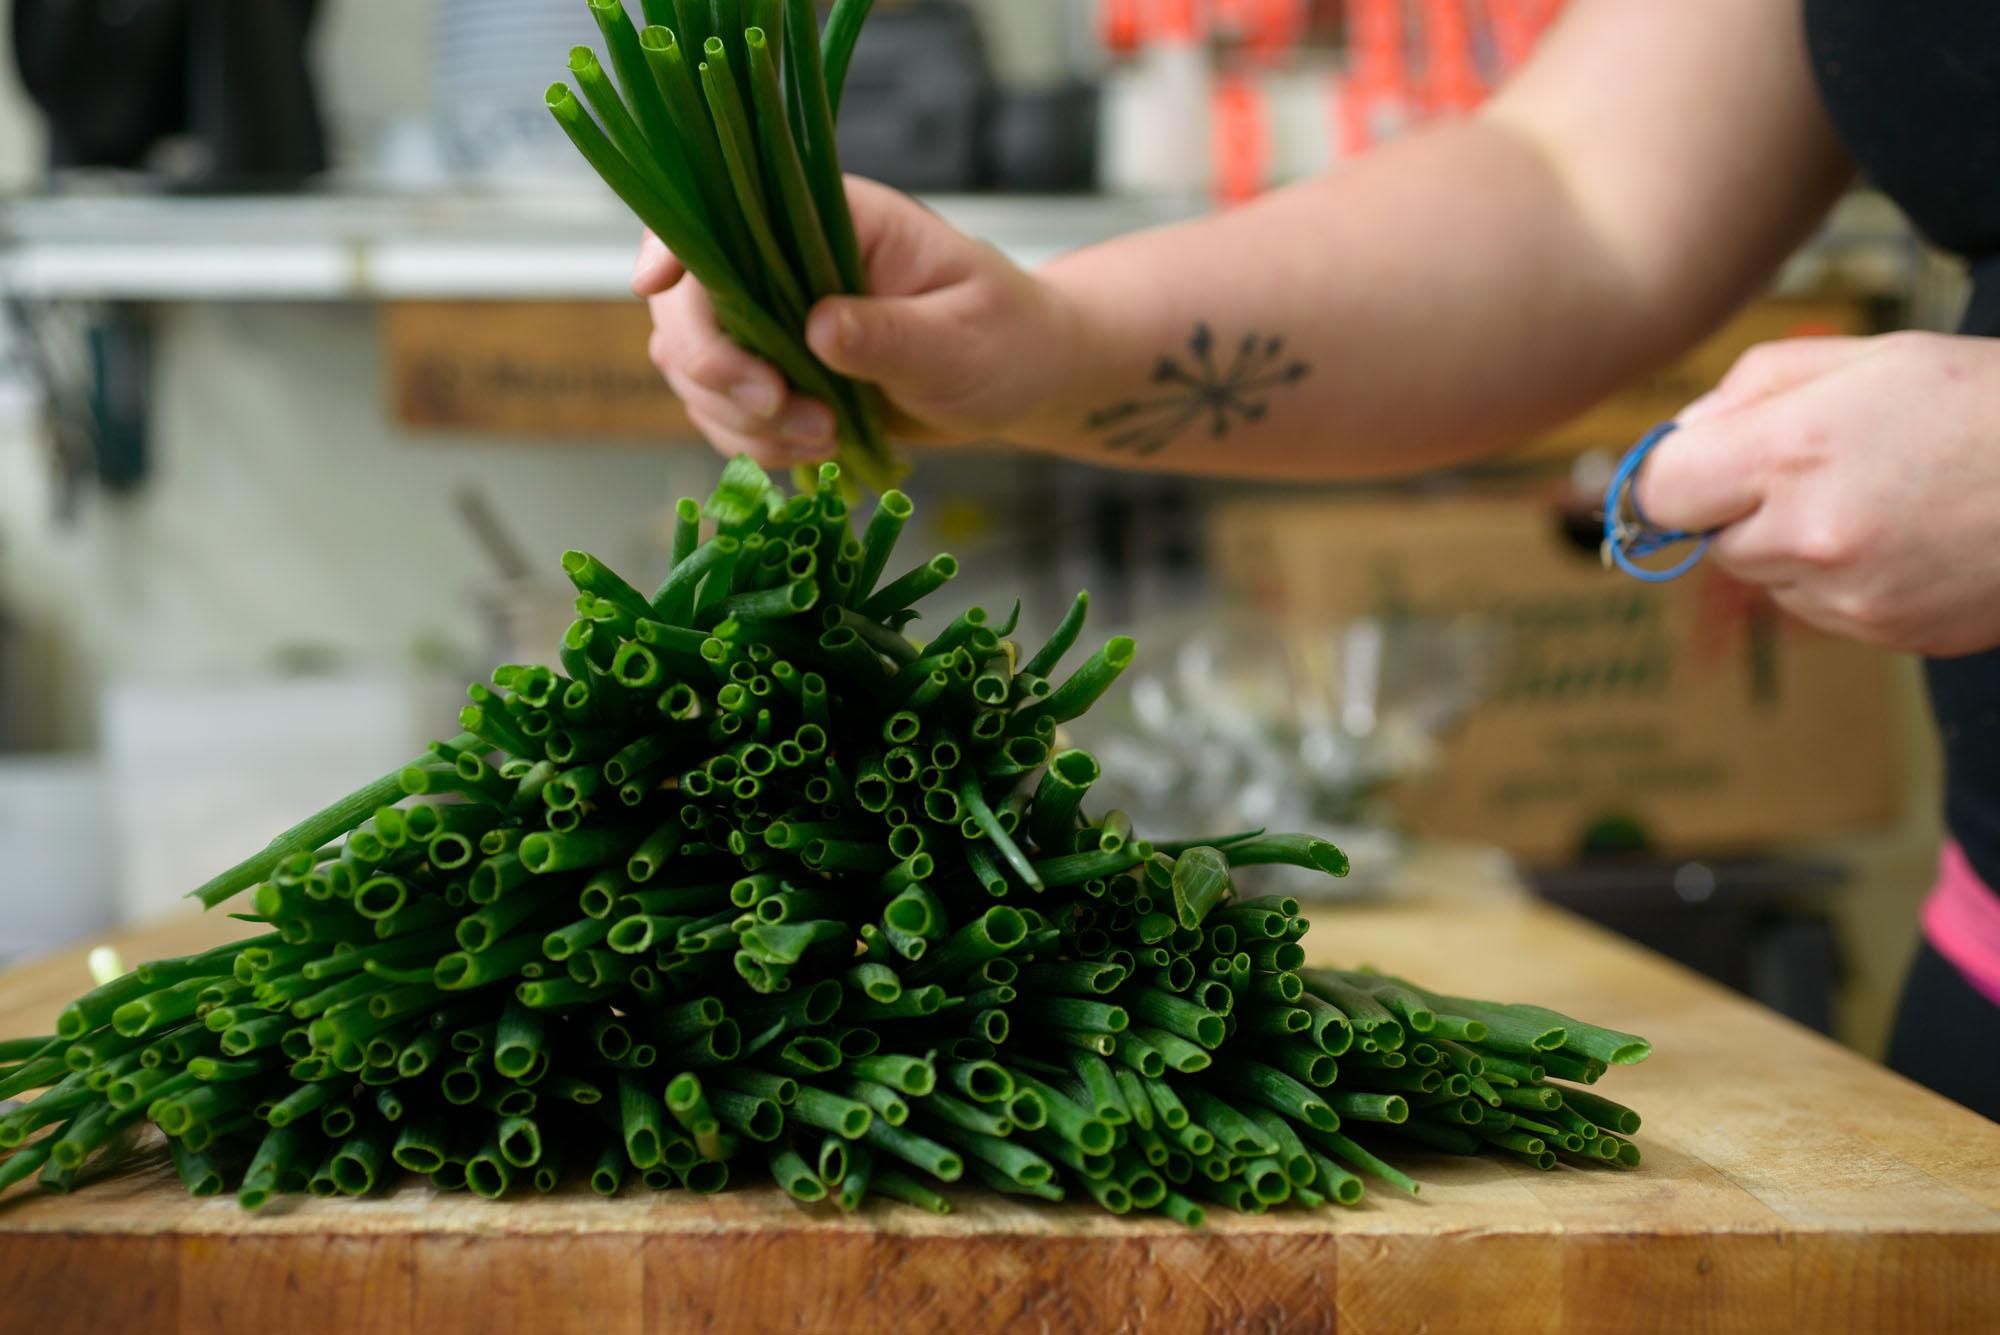 6342_d800_Charlie_Hong_Kong_Santa_Cruz_Restaurant_Food_Photography.jpg